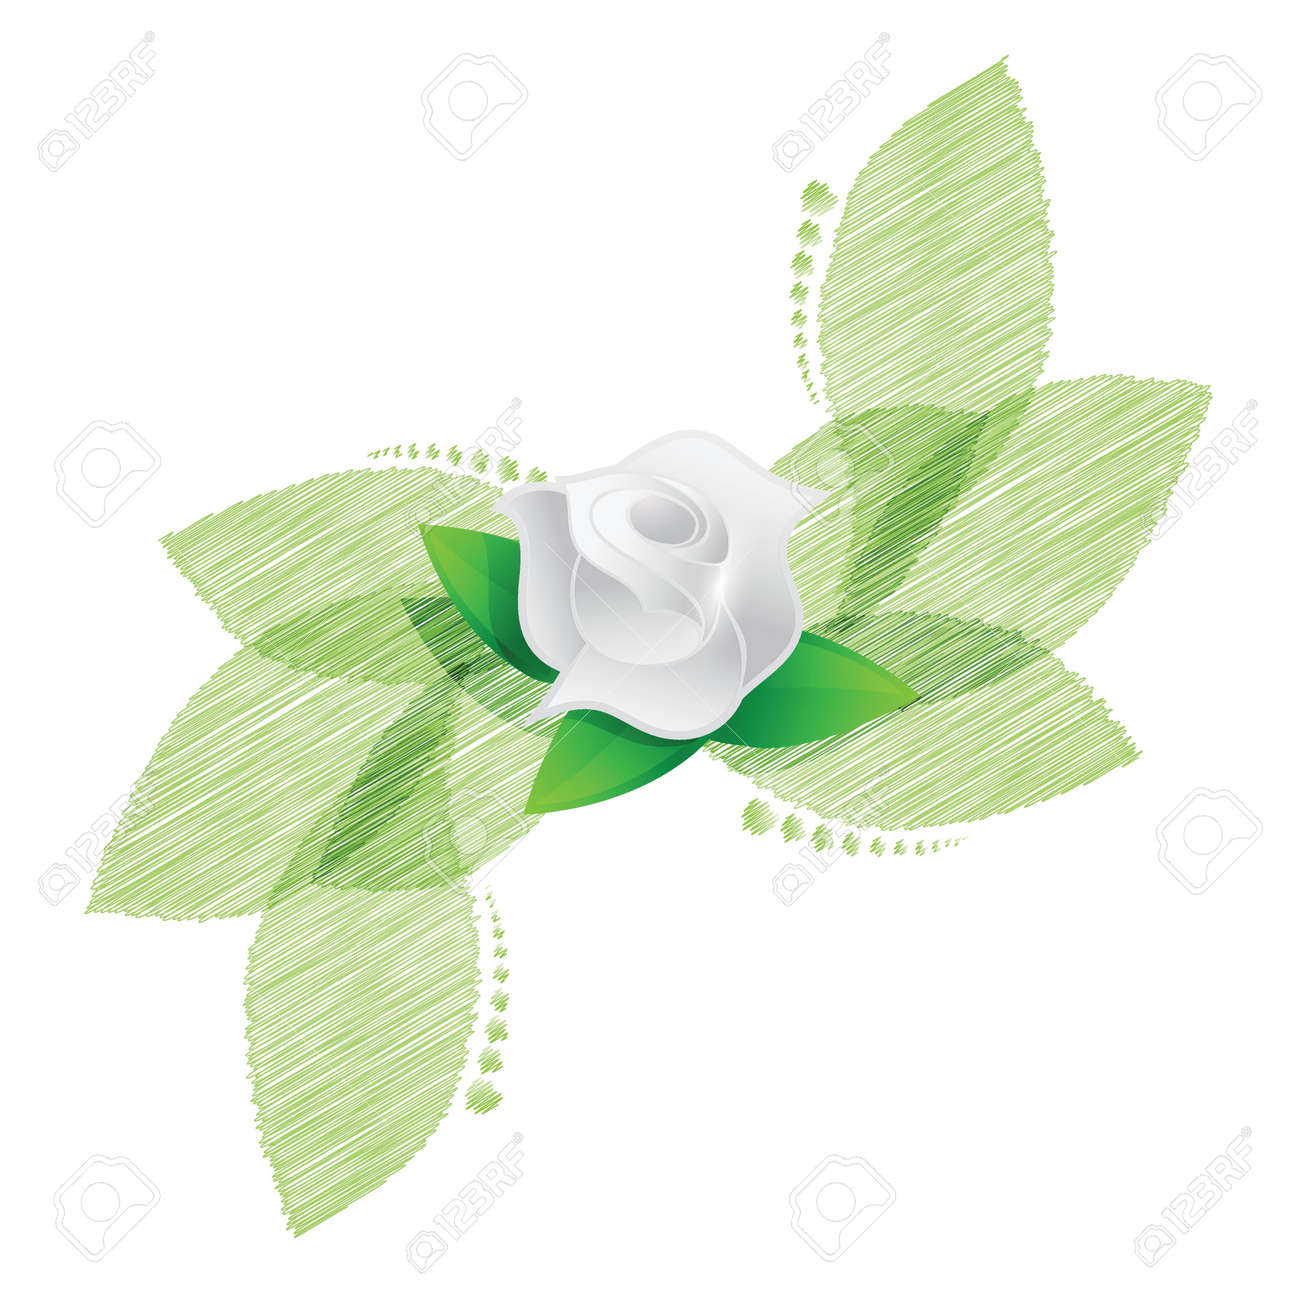 rose over green leaves illustration design over a white background Stock Vector - 20151956